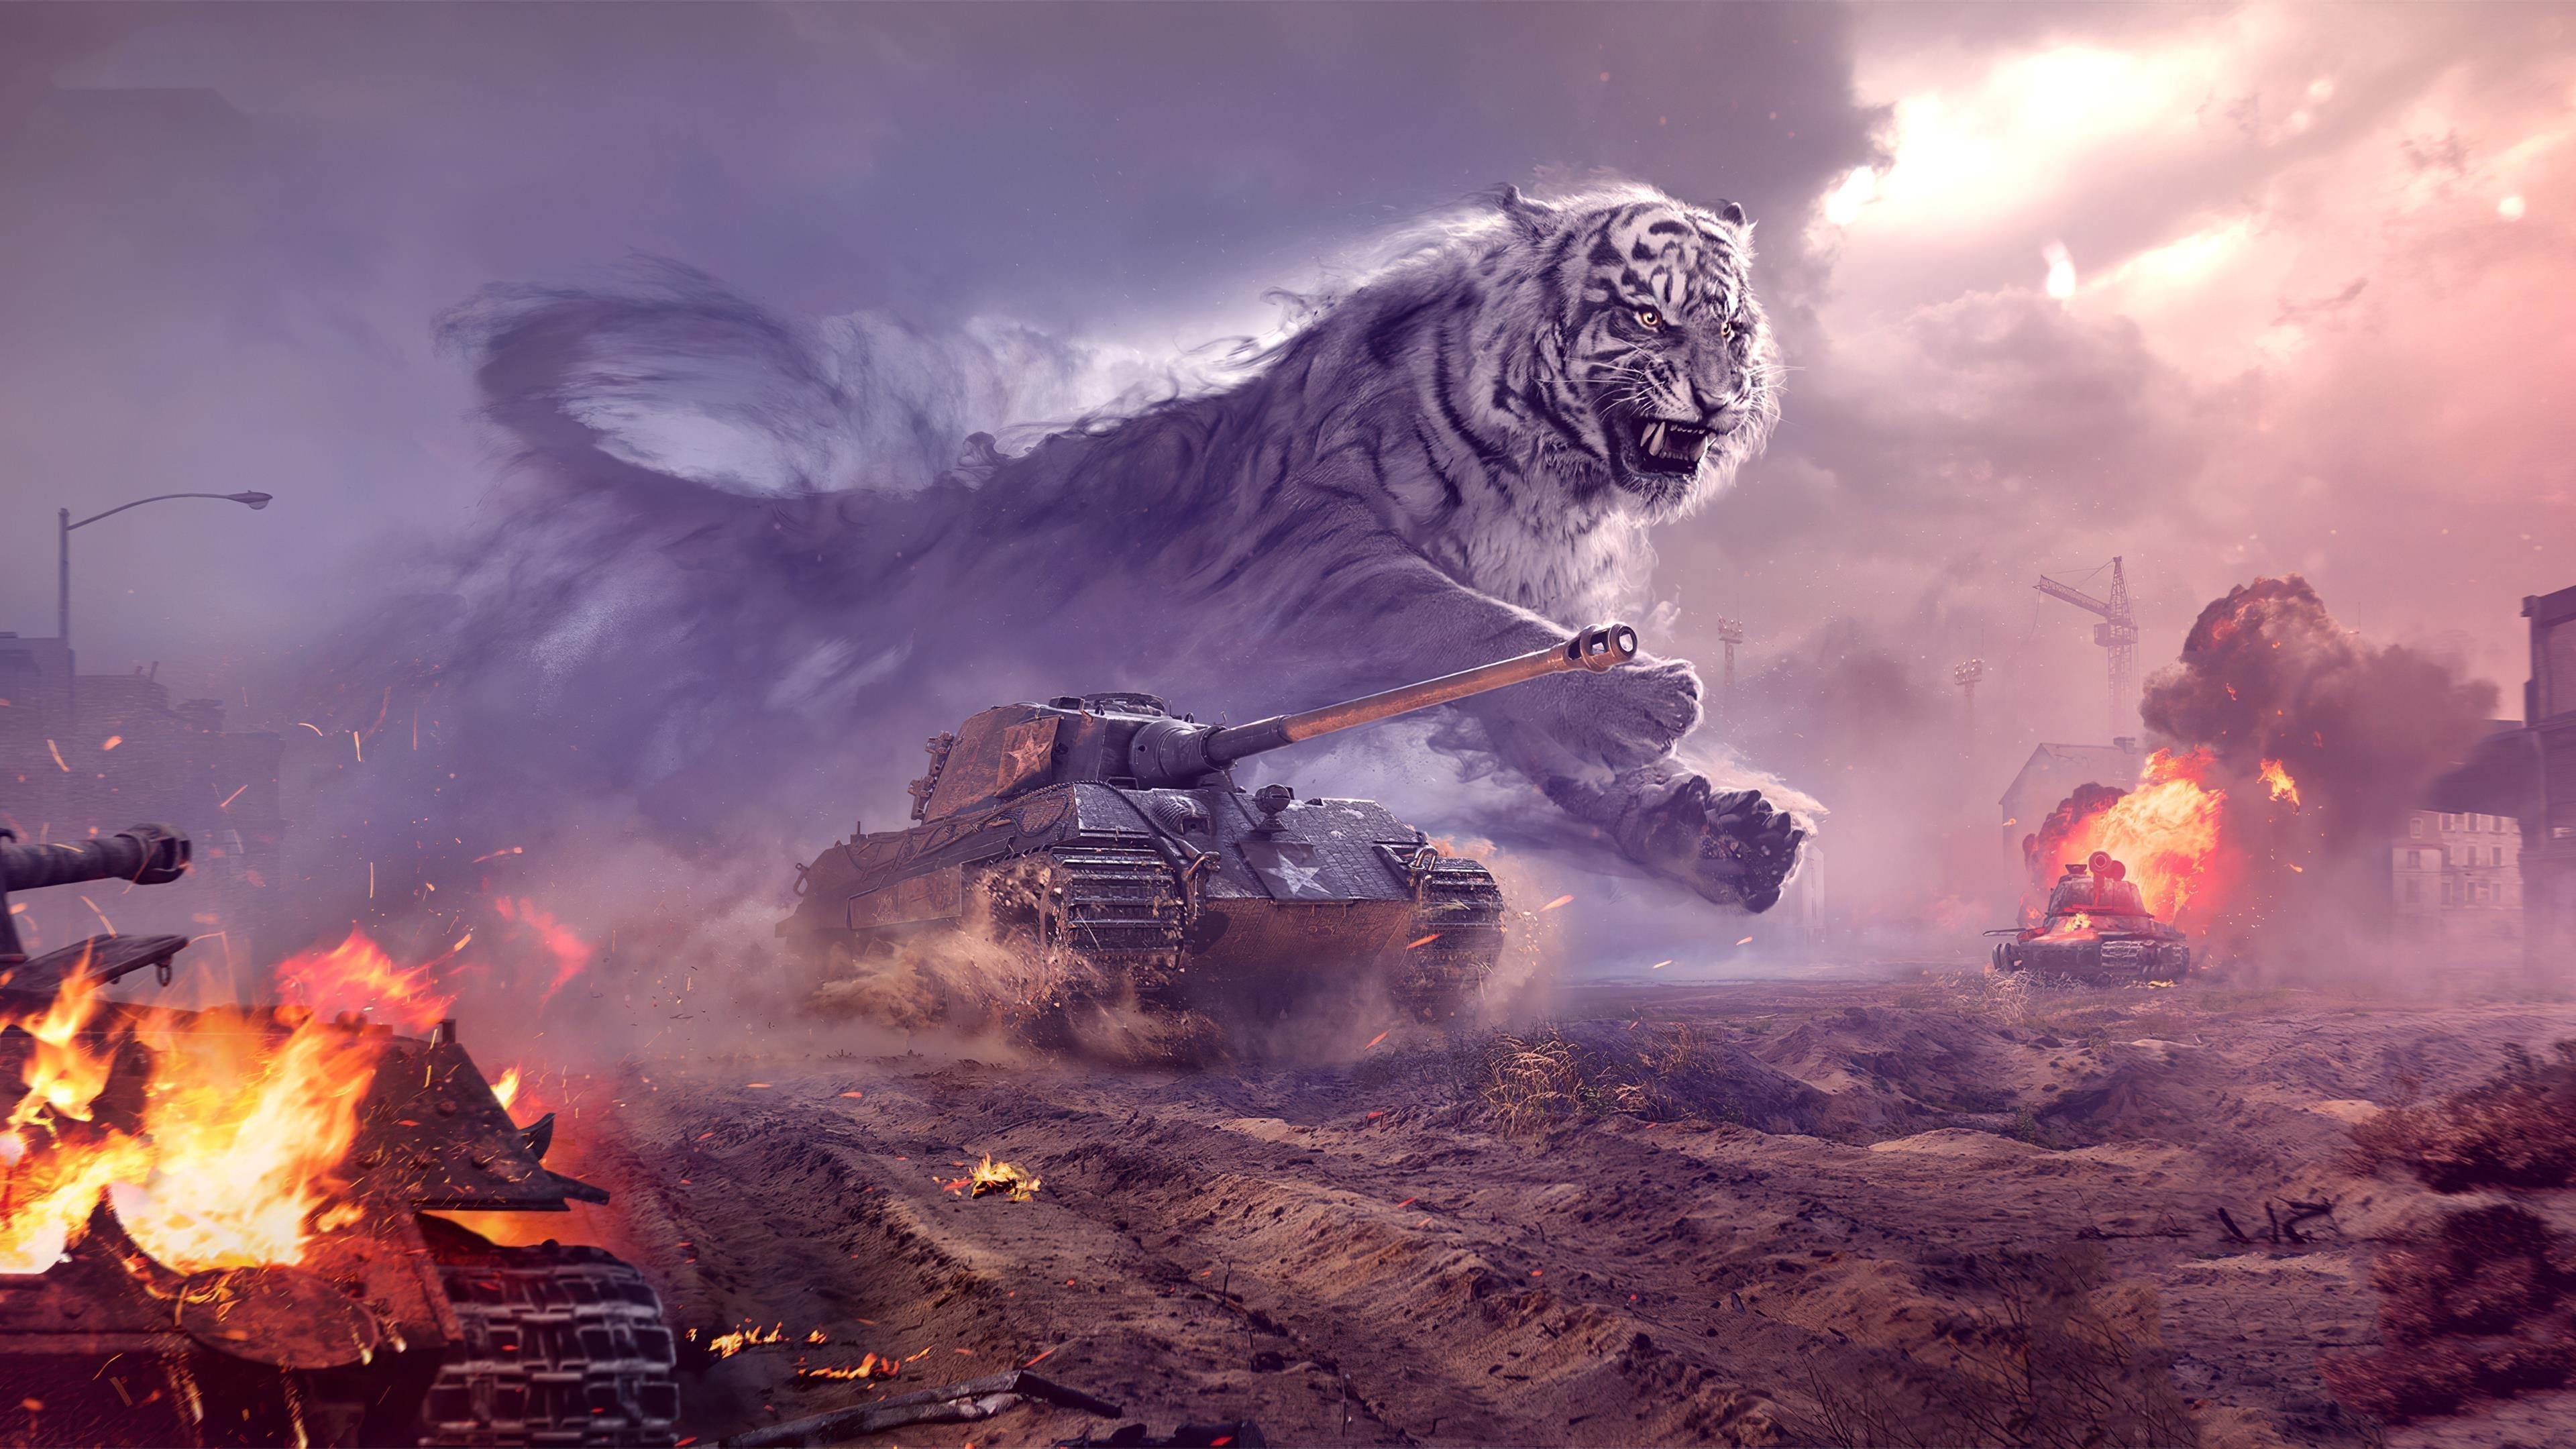 Фан-арт world of tanks обои скачать